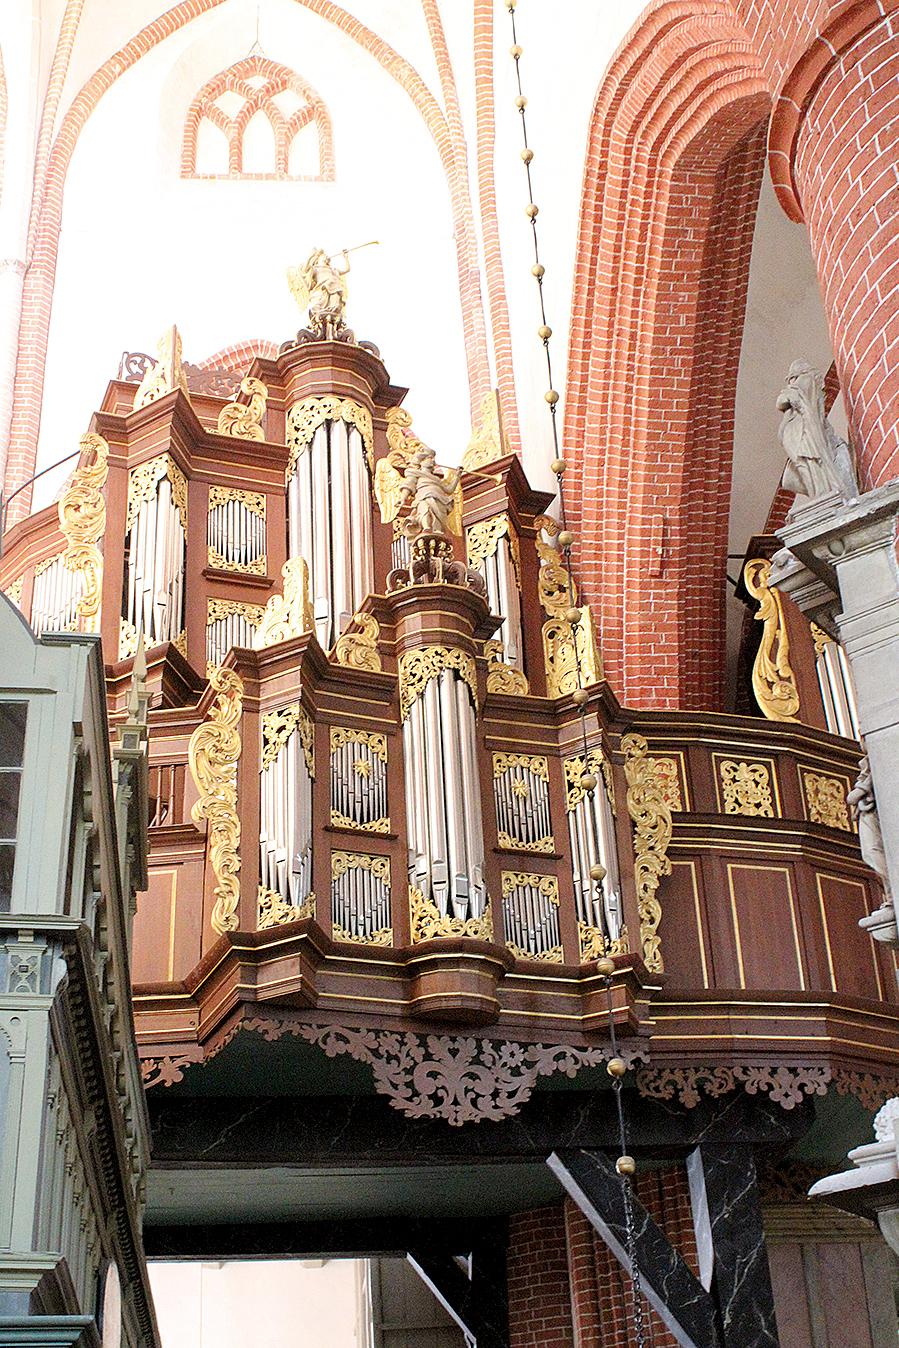 NORDEN.Am südöstl. Vierungspfeiler ist d. Orgel d. Ludgerikirche.Foto.B.Meier.2.2015